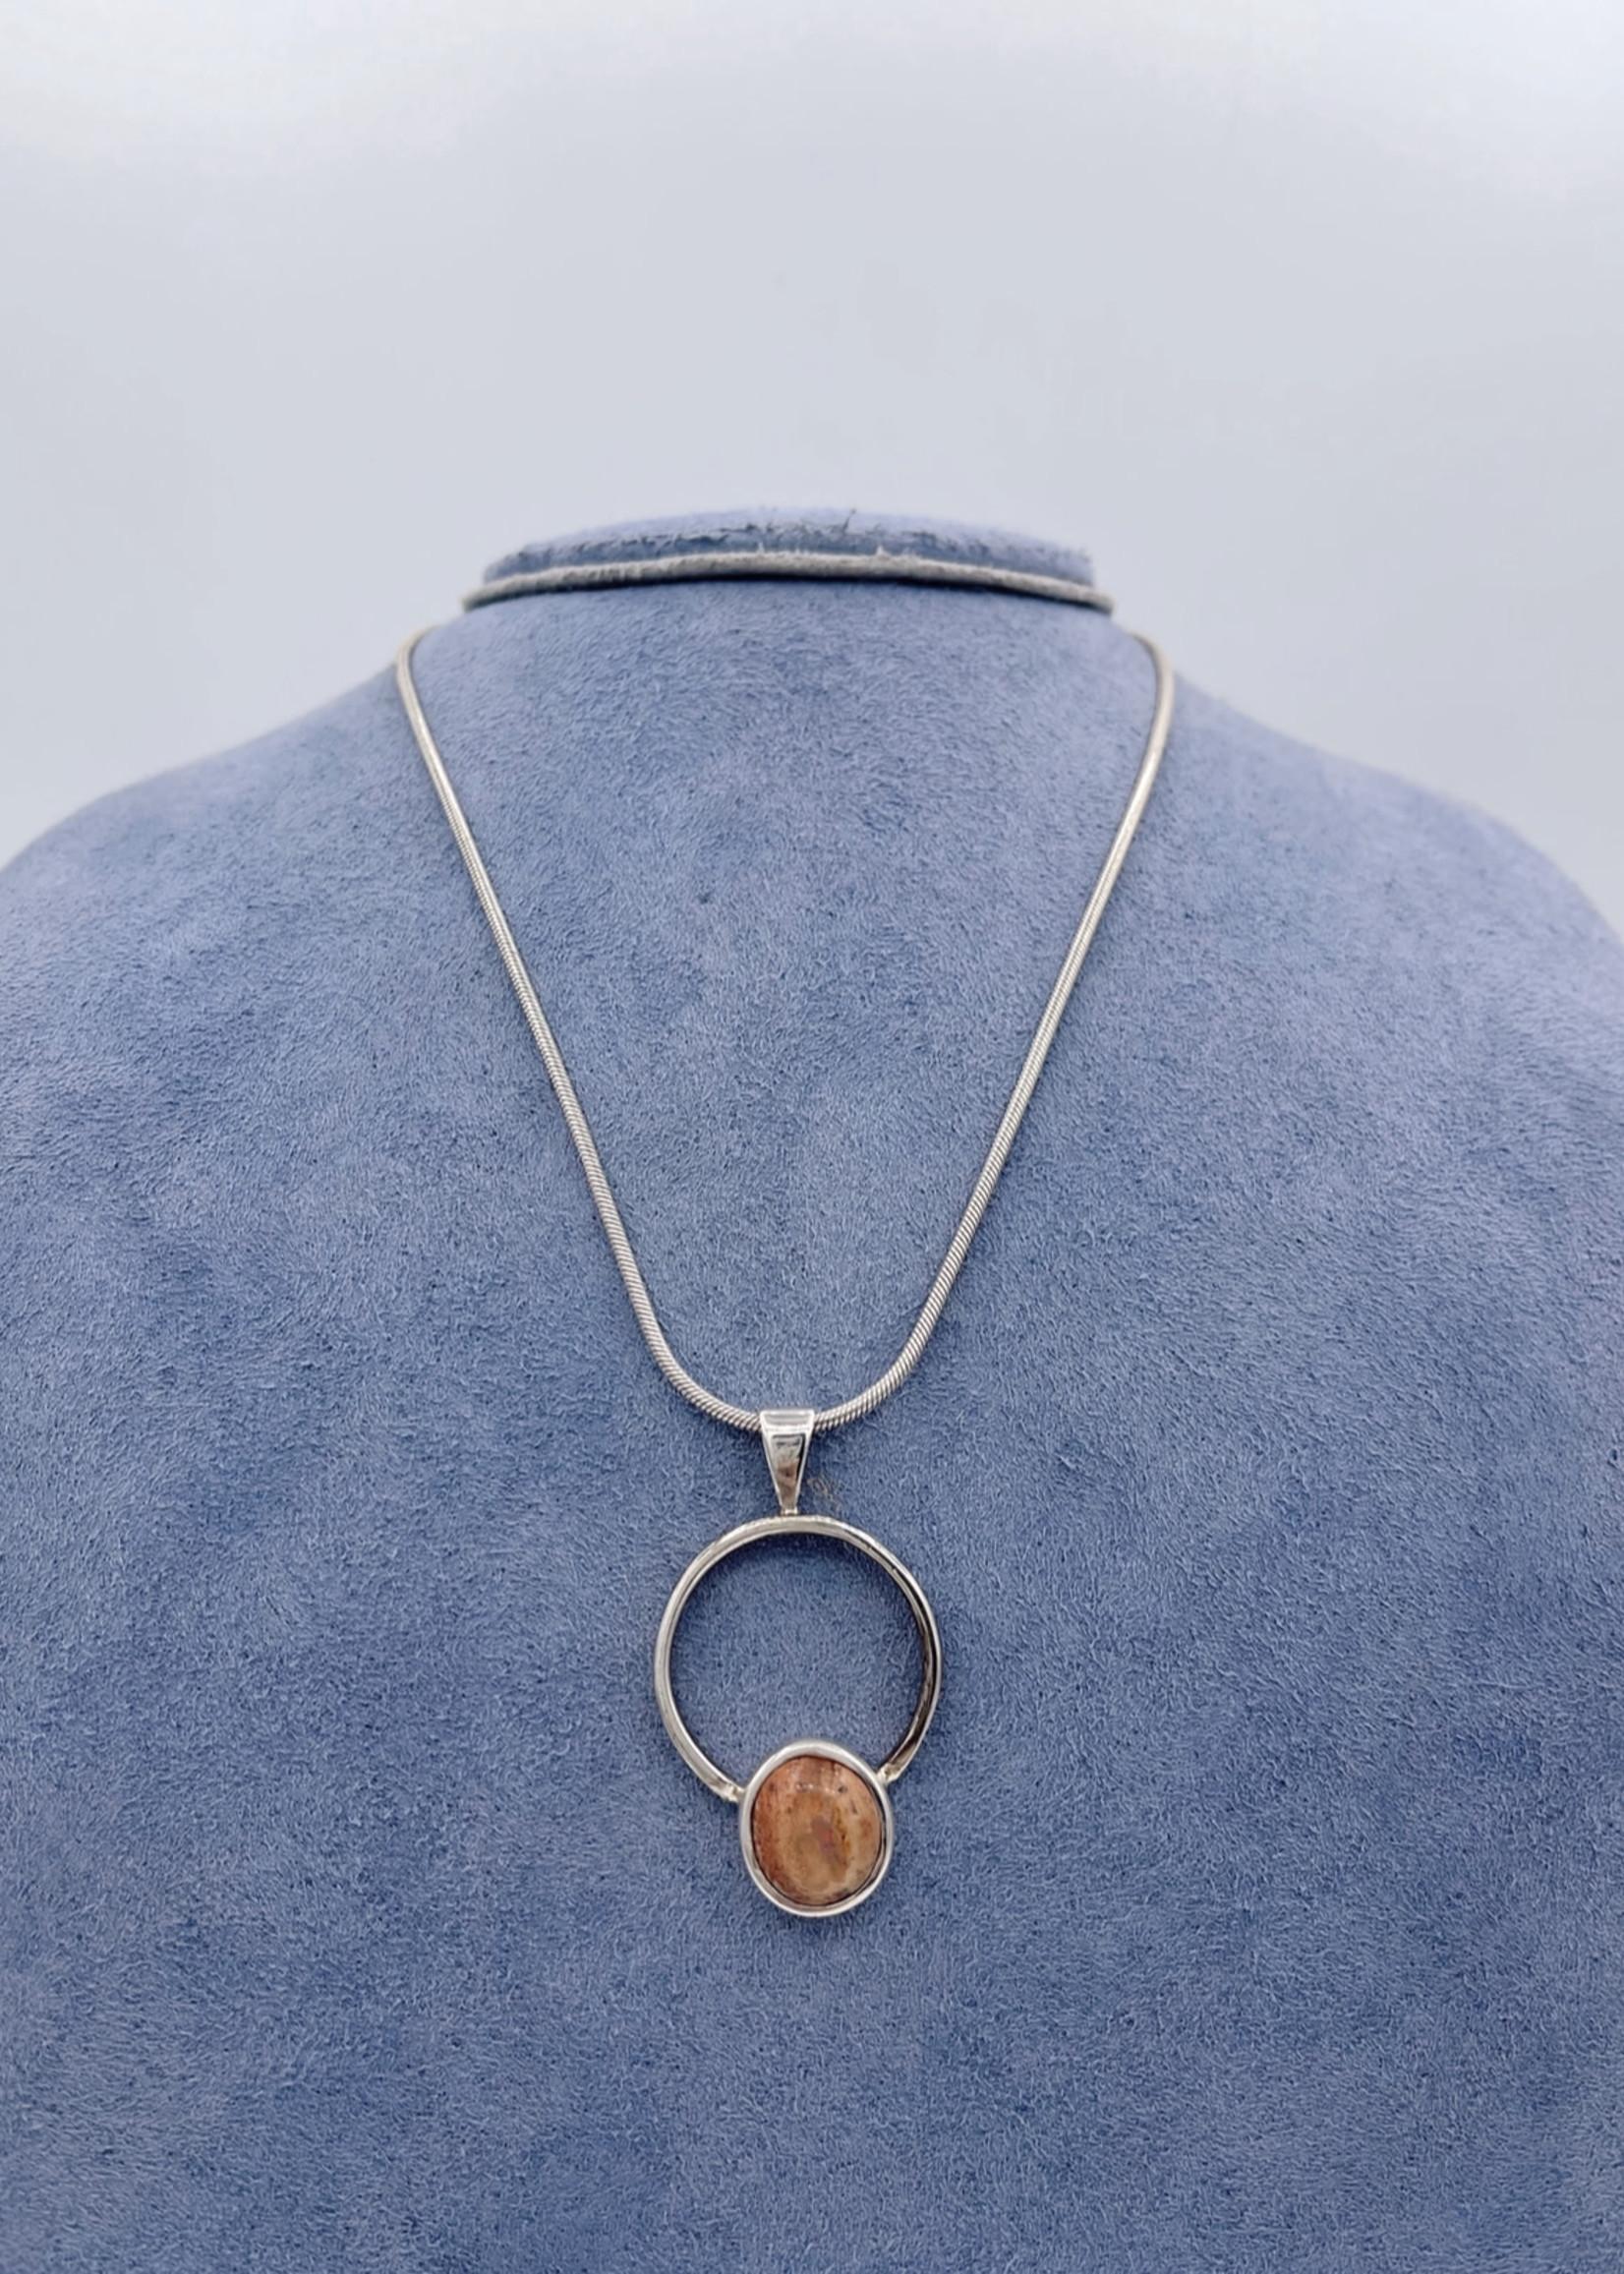 CJ Designs Mexican Opal Necklace